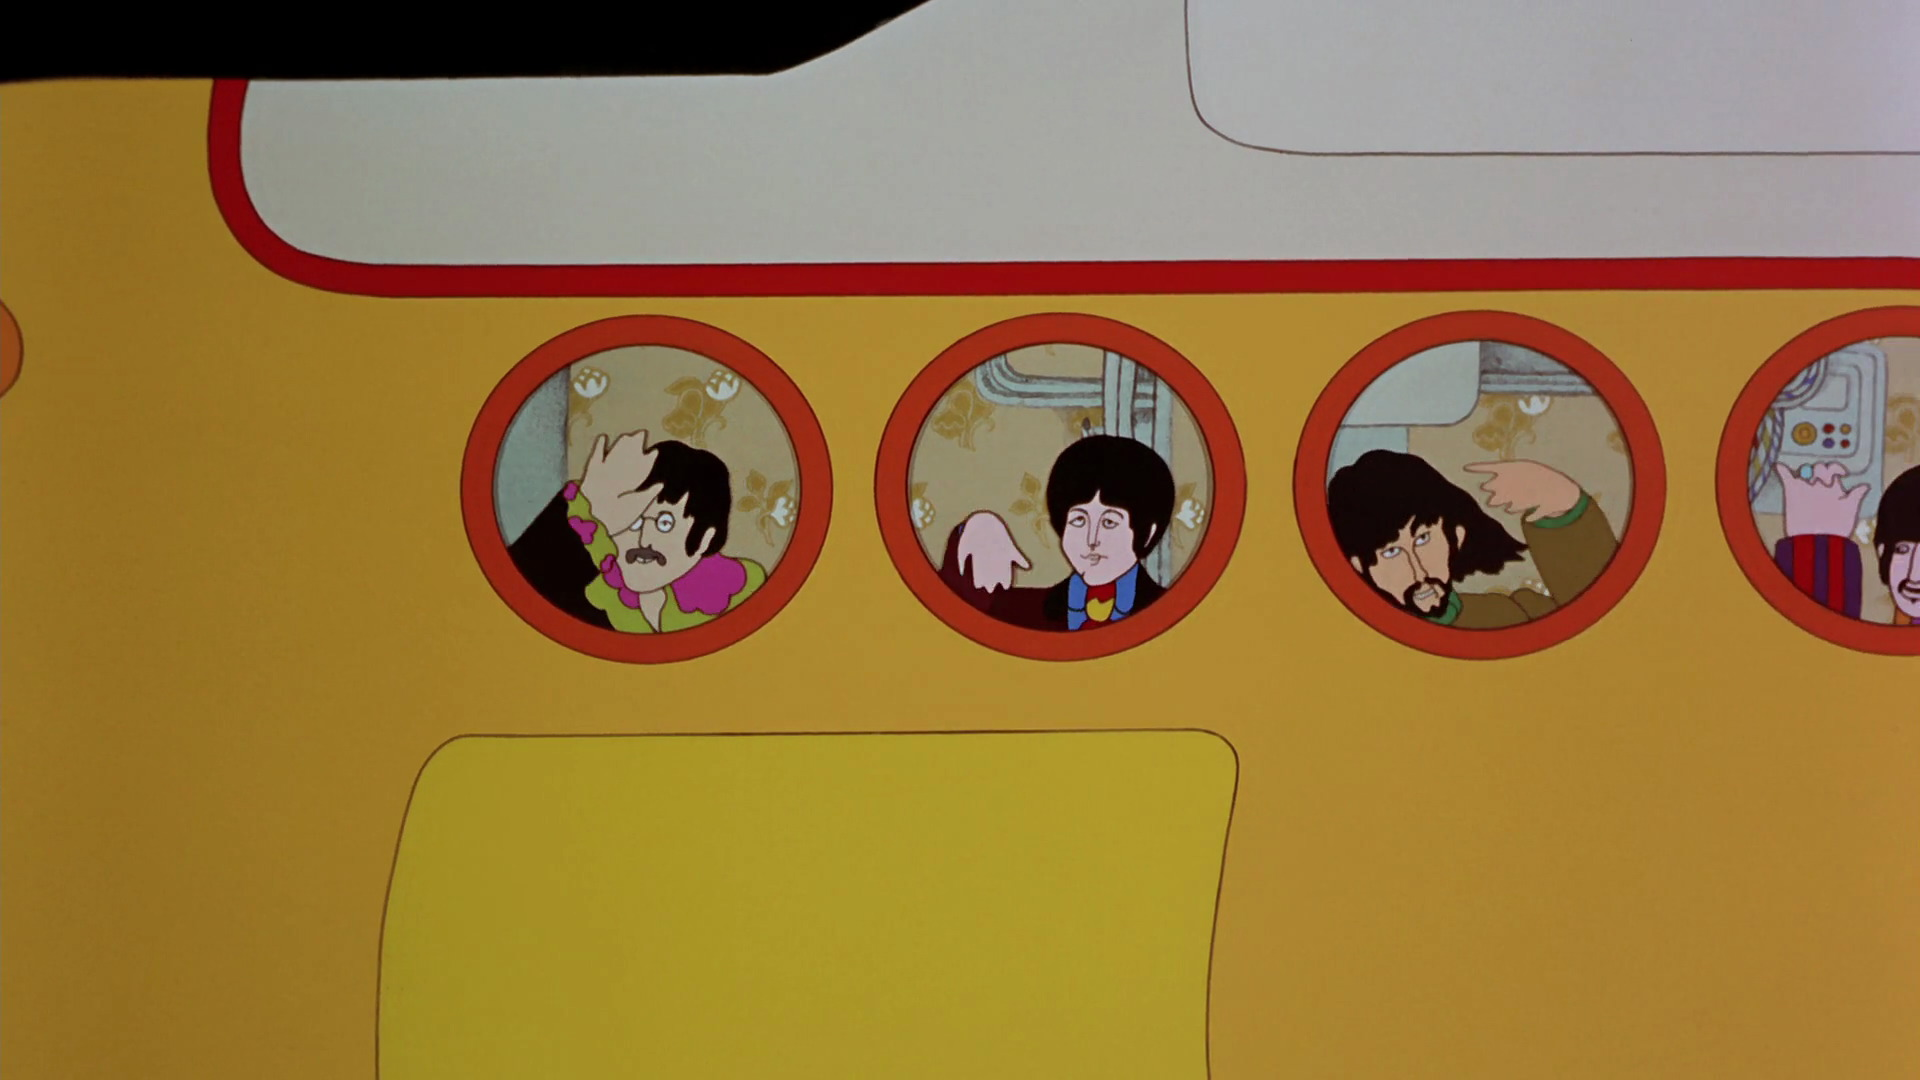 yellow-submarine-disneyscreencaps.com-3328.jpg